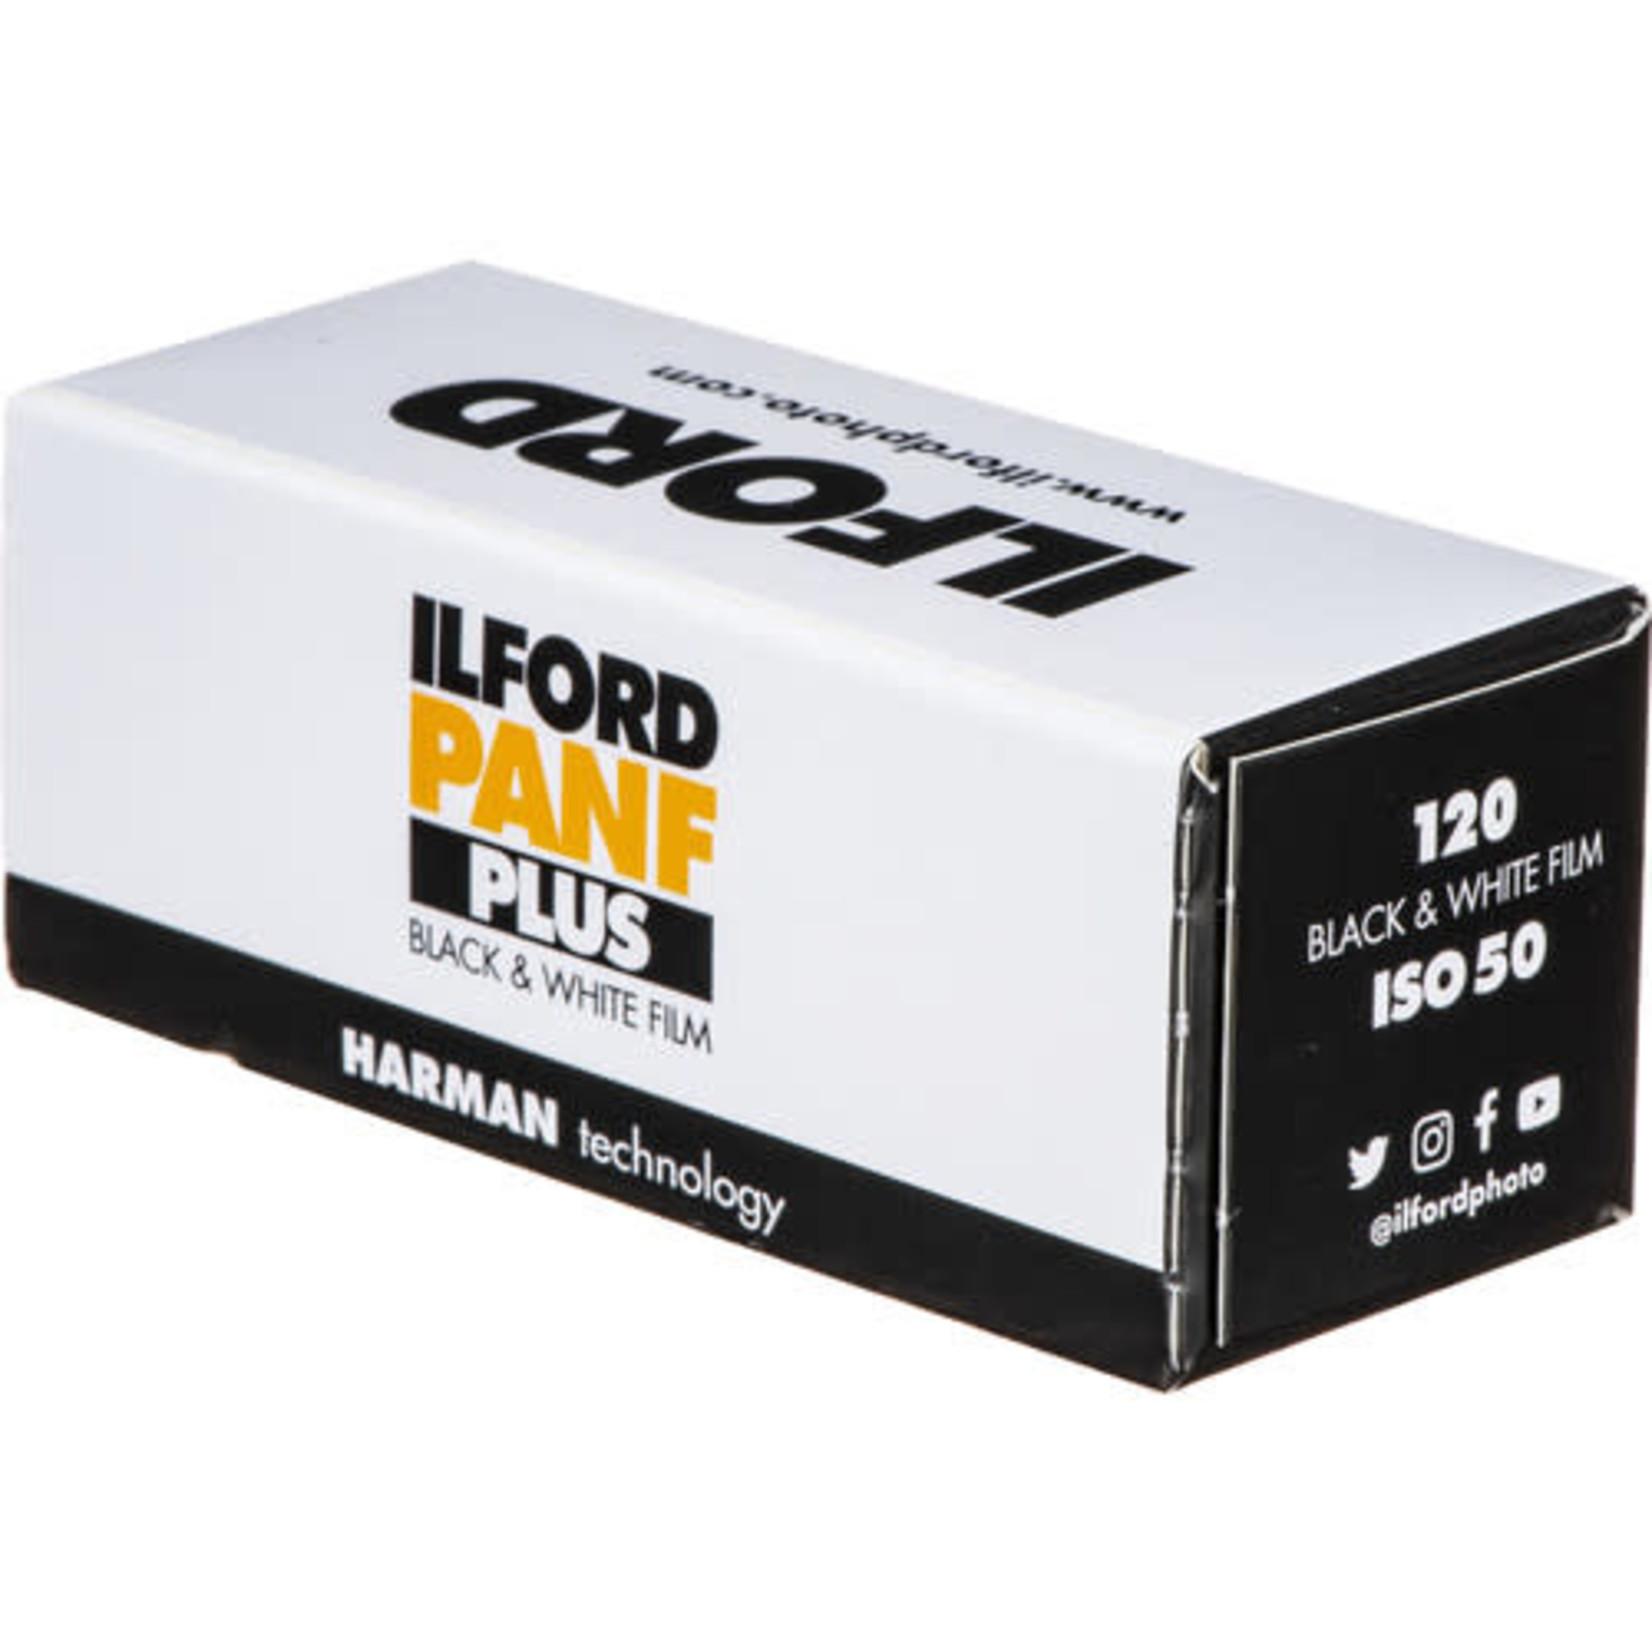 Ilford Ilford Pan F Plus Black and White Negative Film (120 Roll Film)